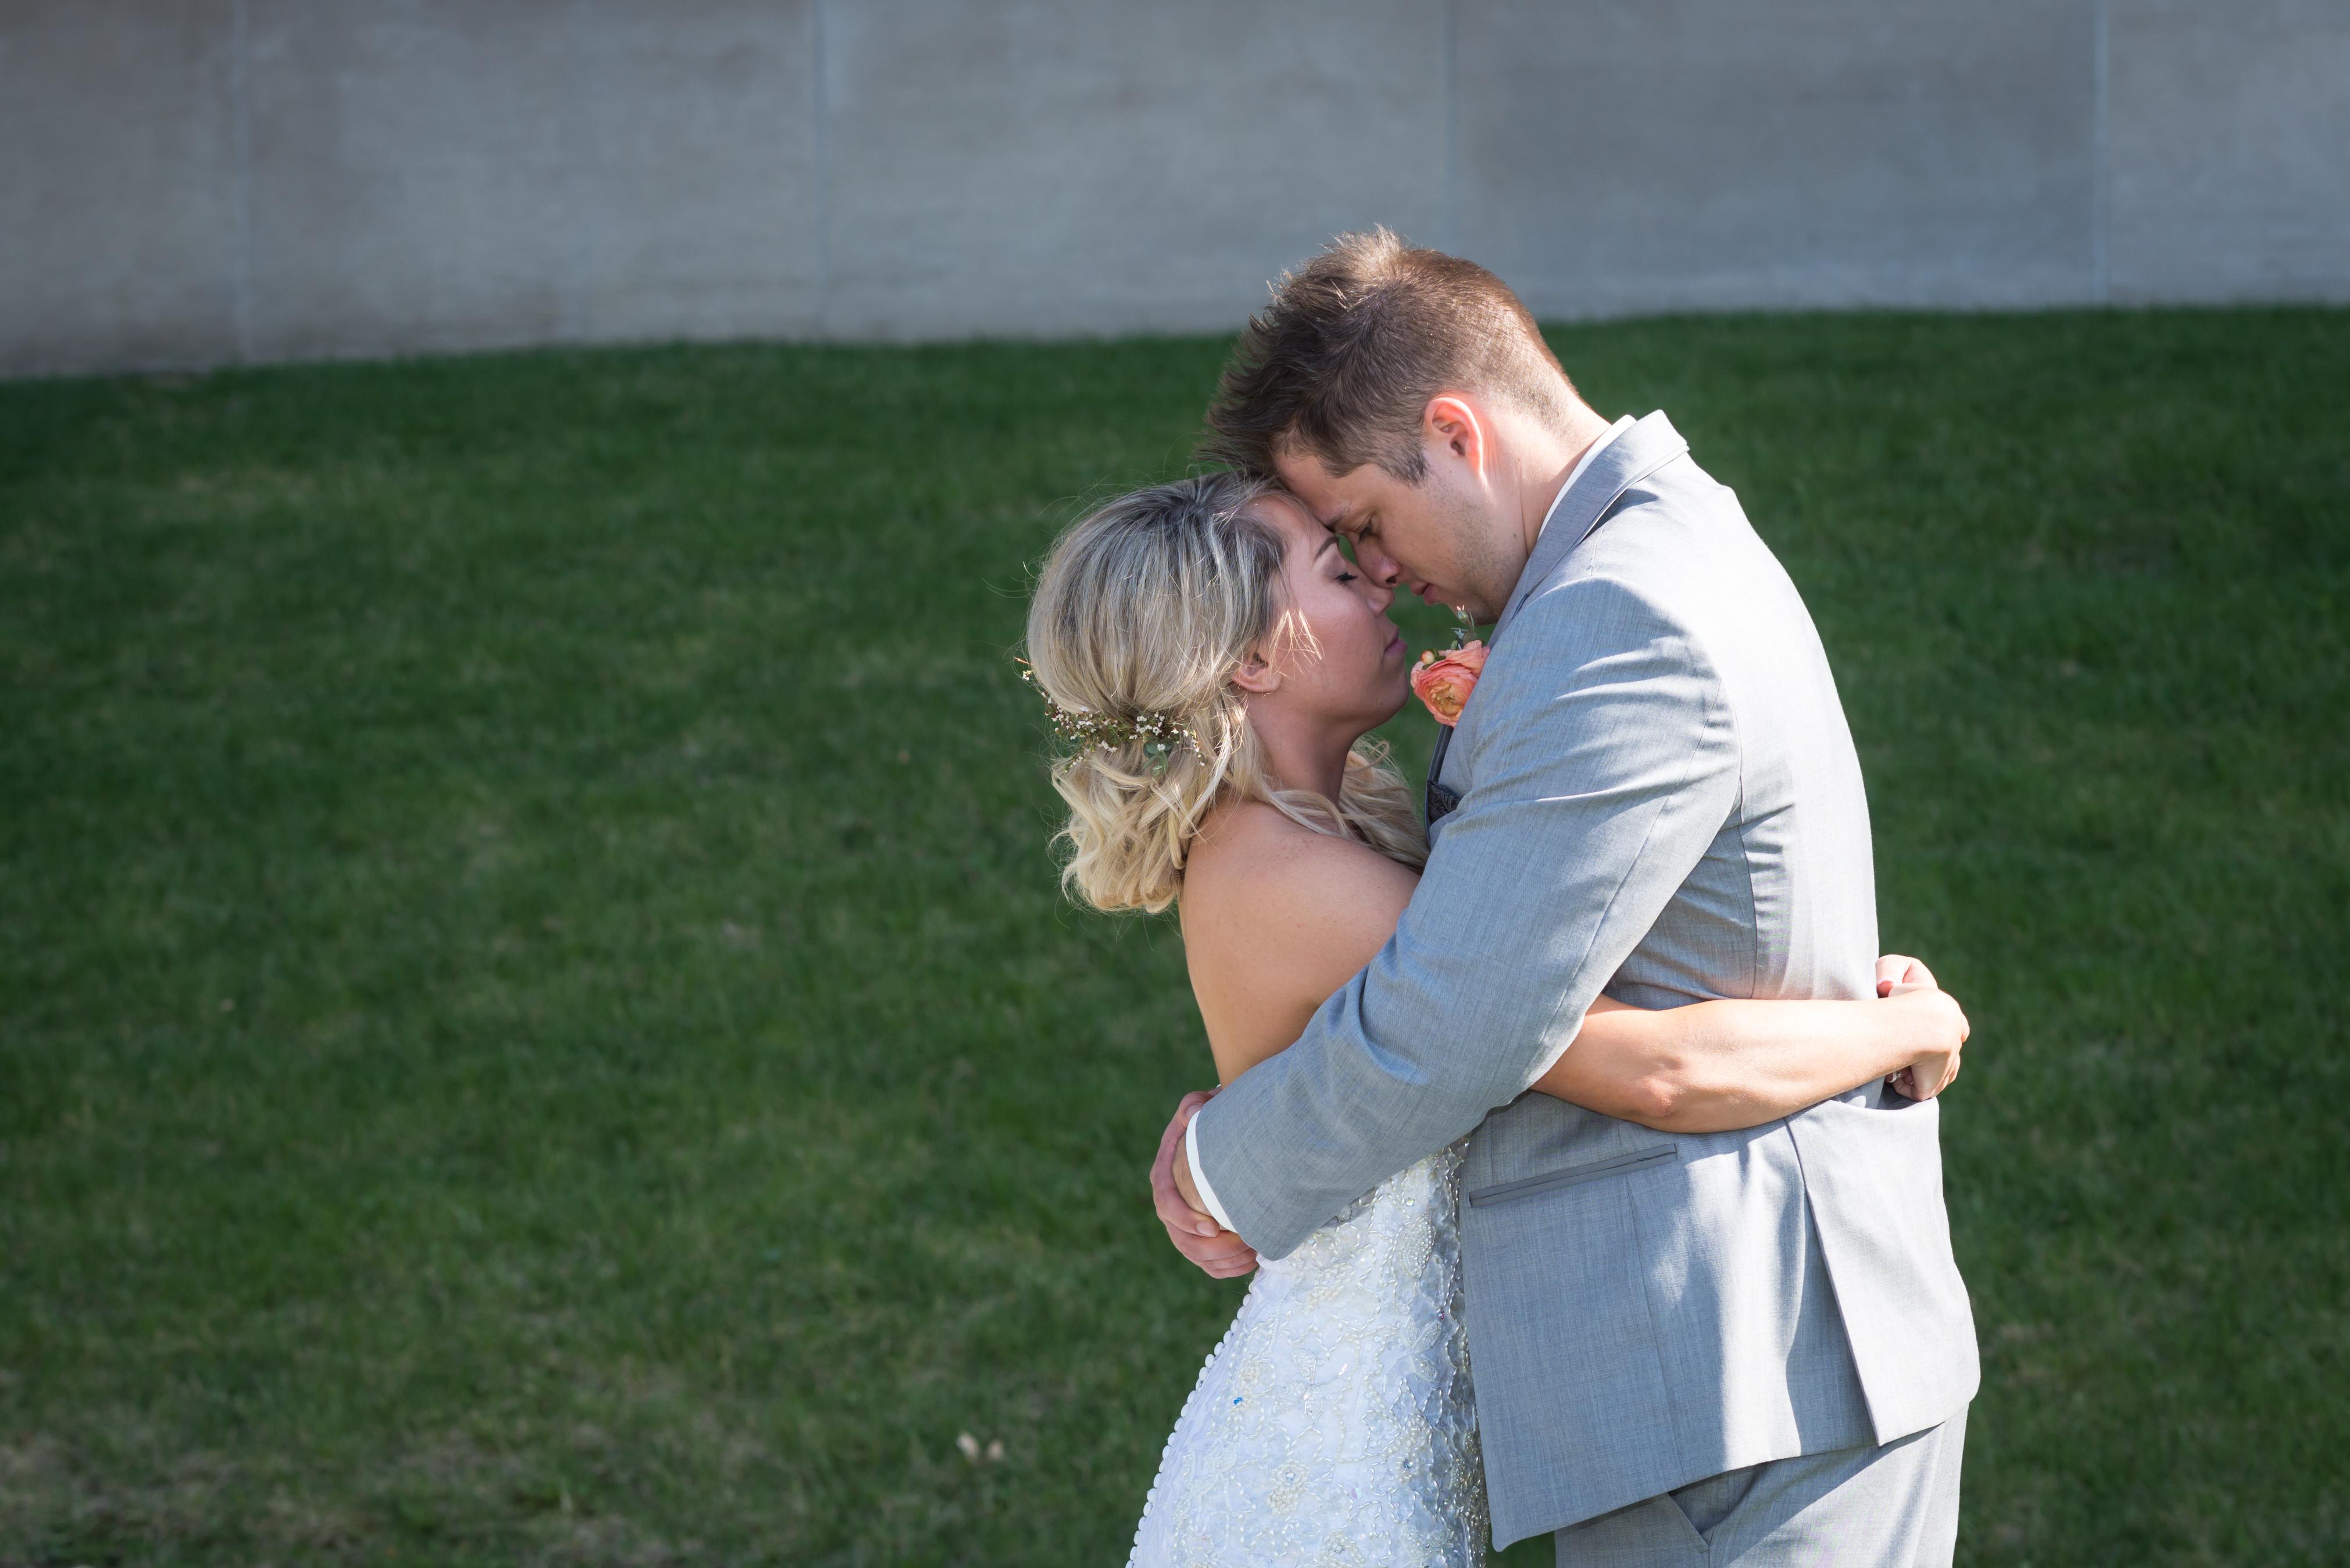 Mr. and Mrs. Senne!